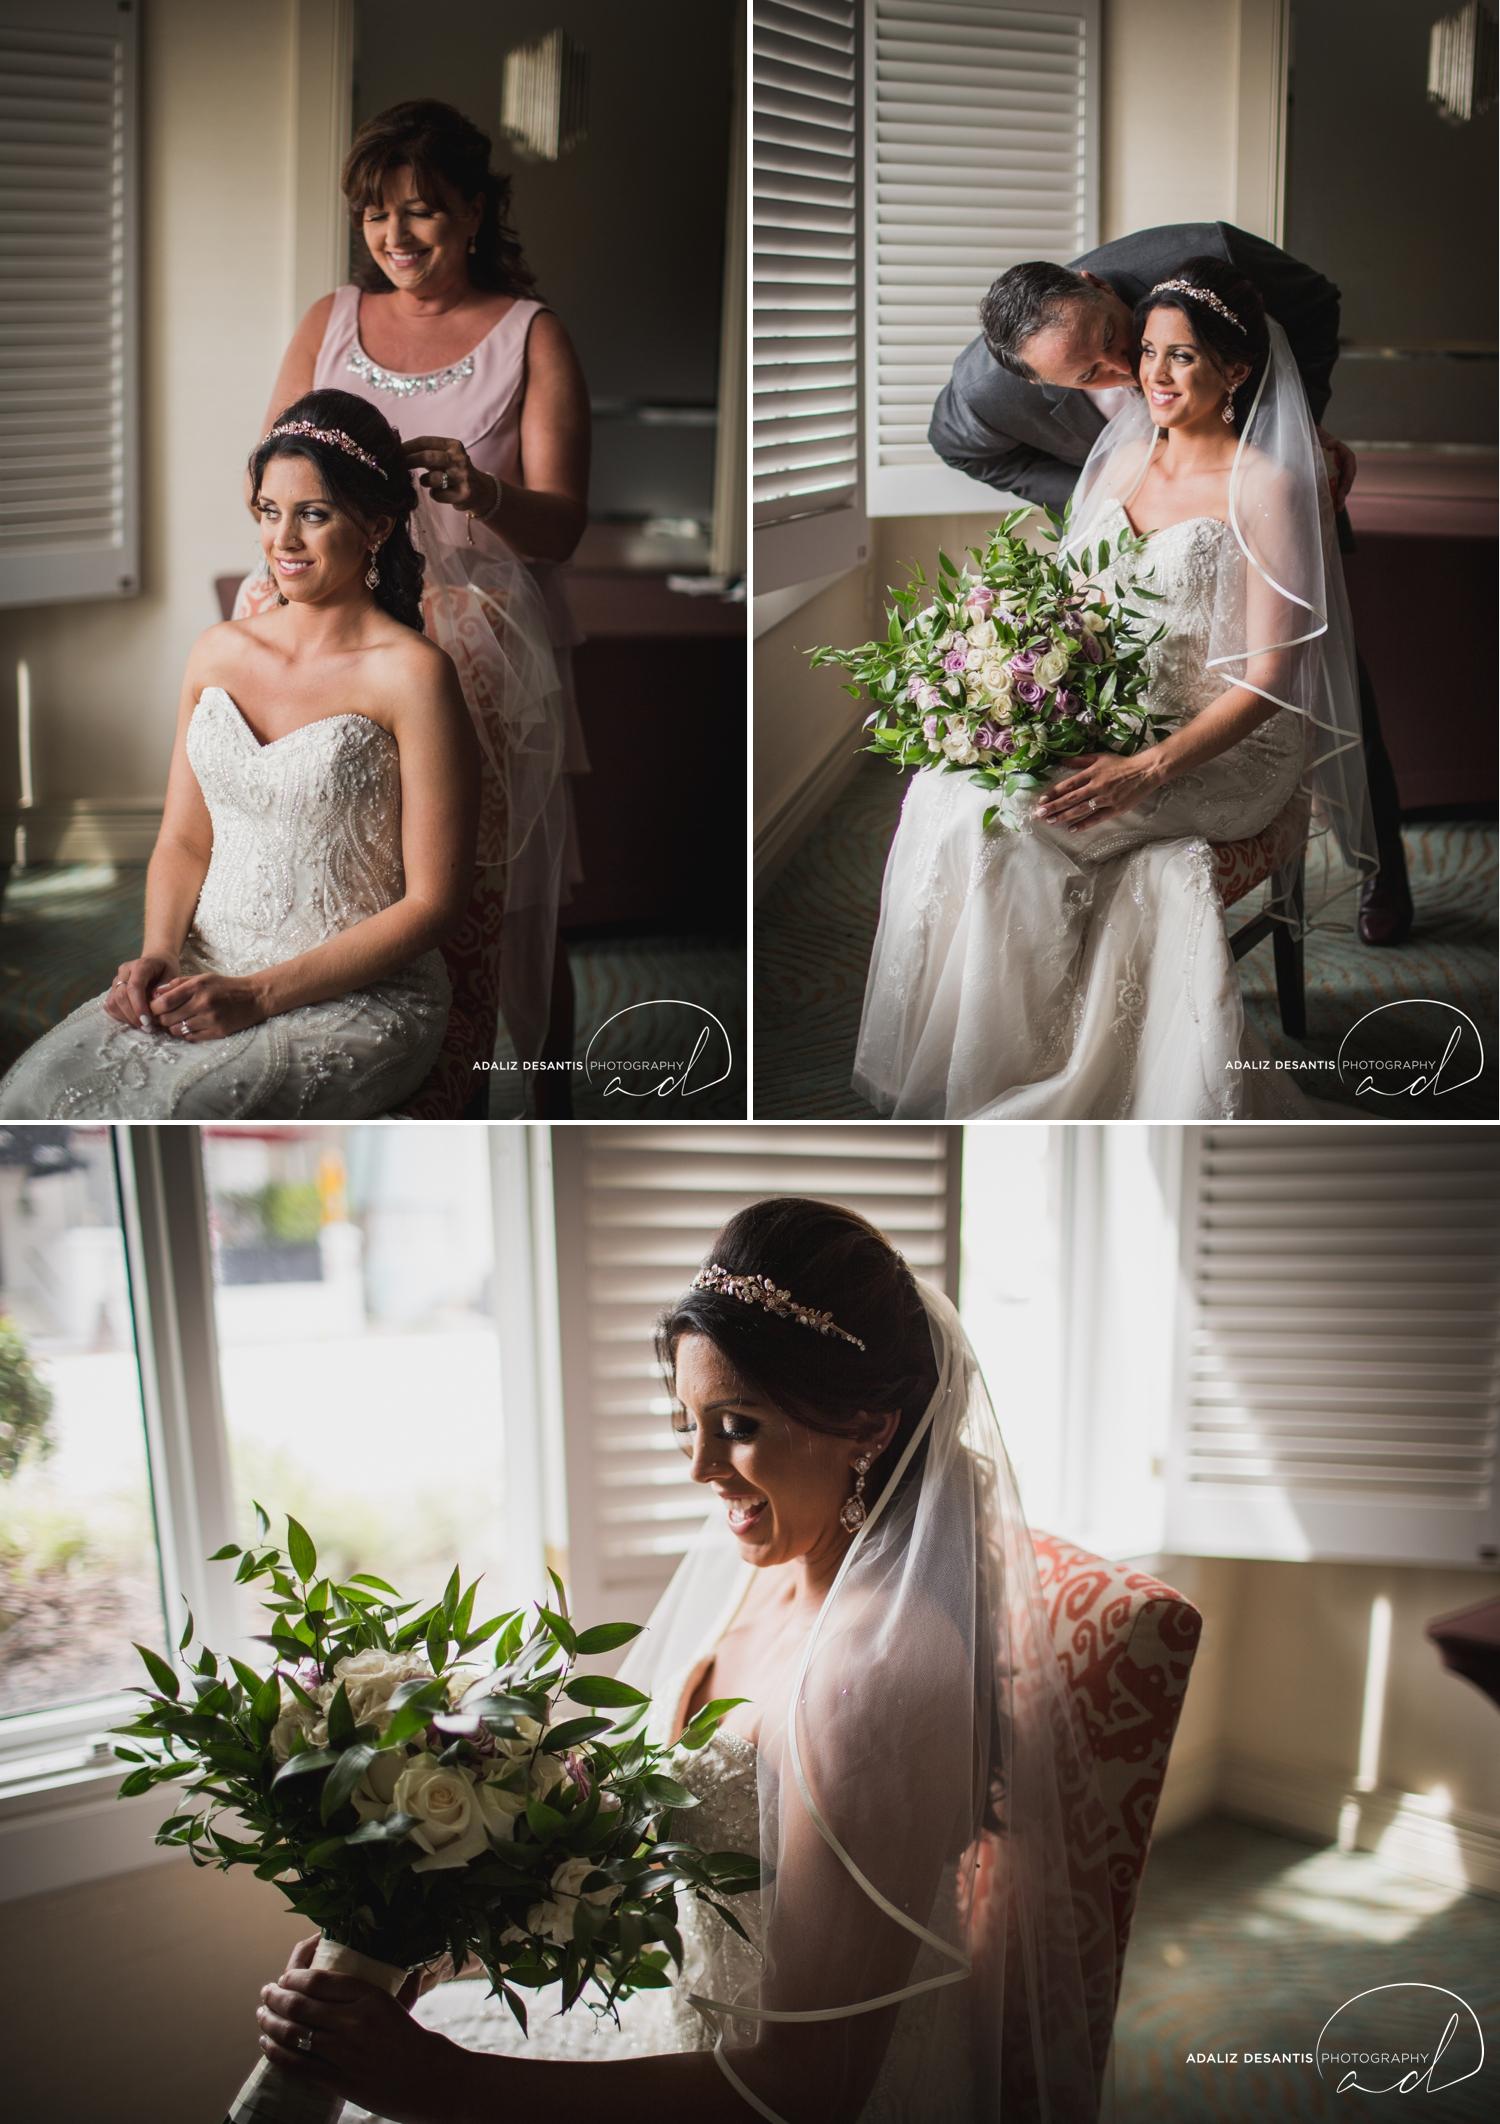 Carmen Alex palms hotel spa miami beach destination wedding lavender roses cuban cigar England cuba bride rose gold elegant Maggie Sottero Badgley Mischka 6.jpg